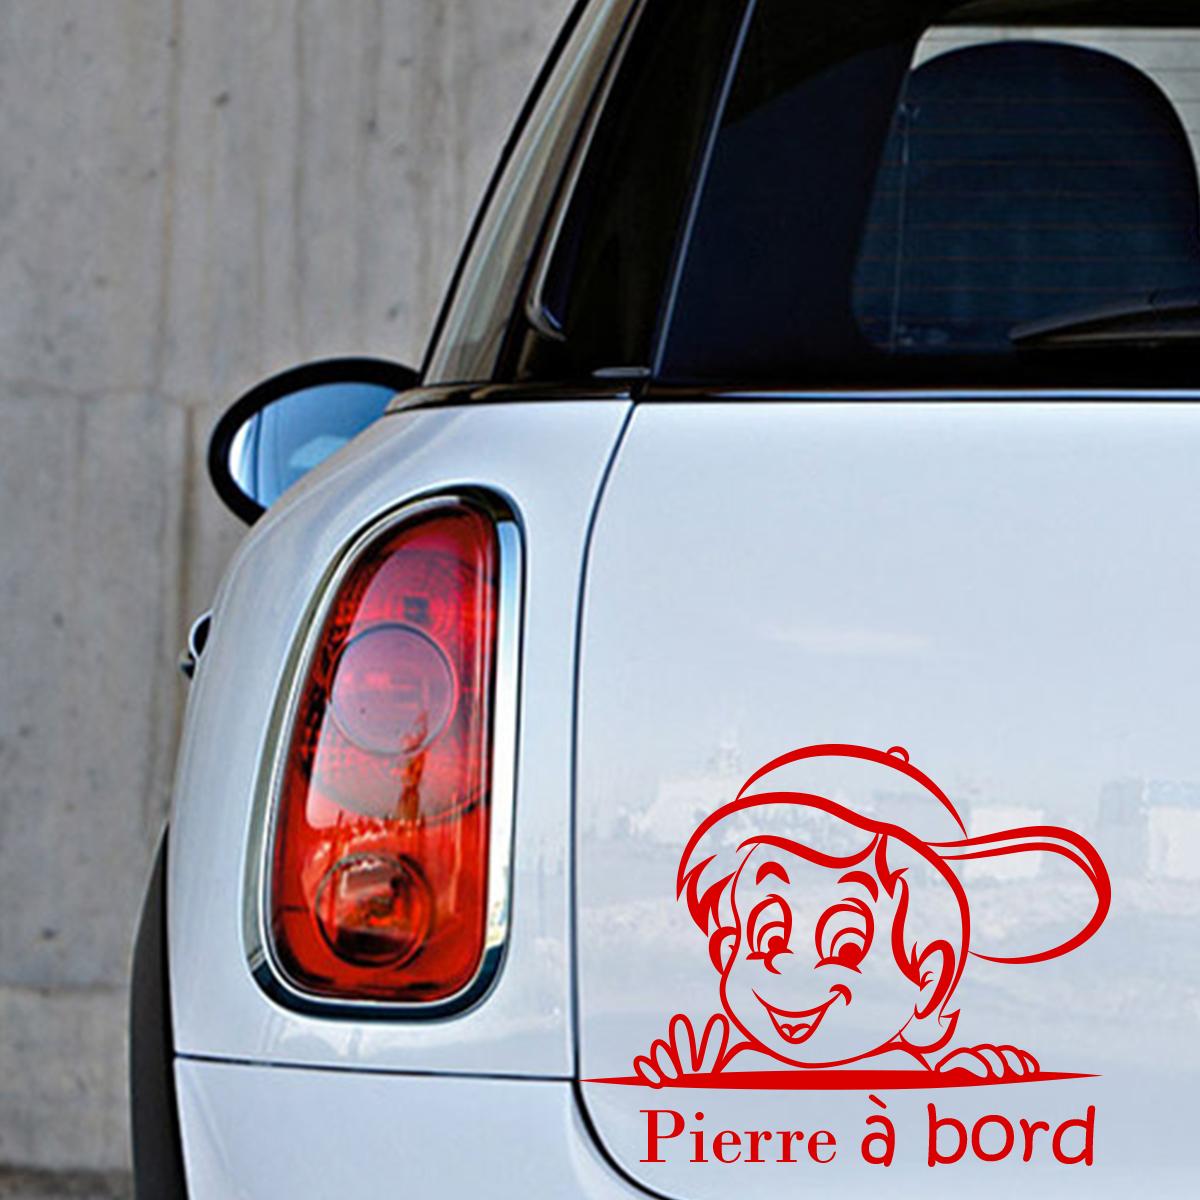 Personnalisé football fan à bord voiture signe ~ baby on board ~ blonde boy l bleu